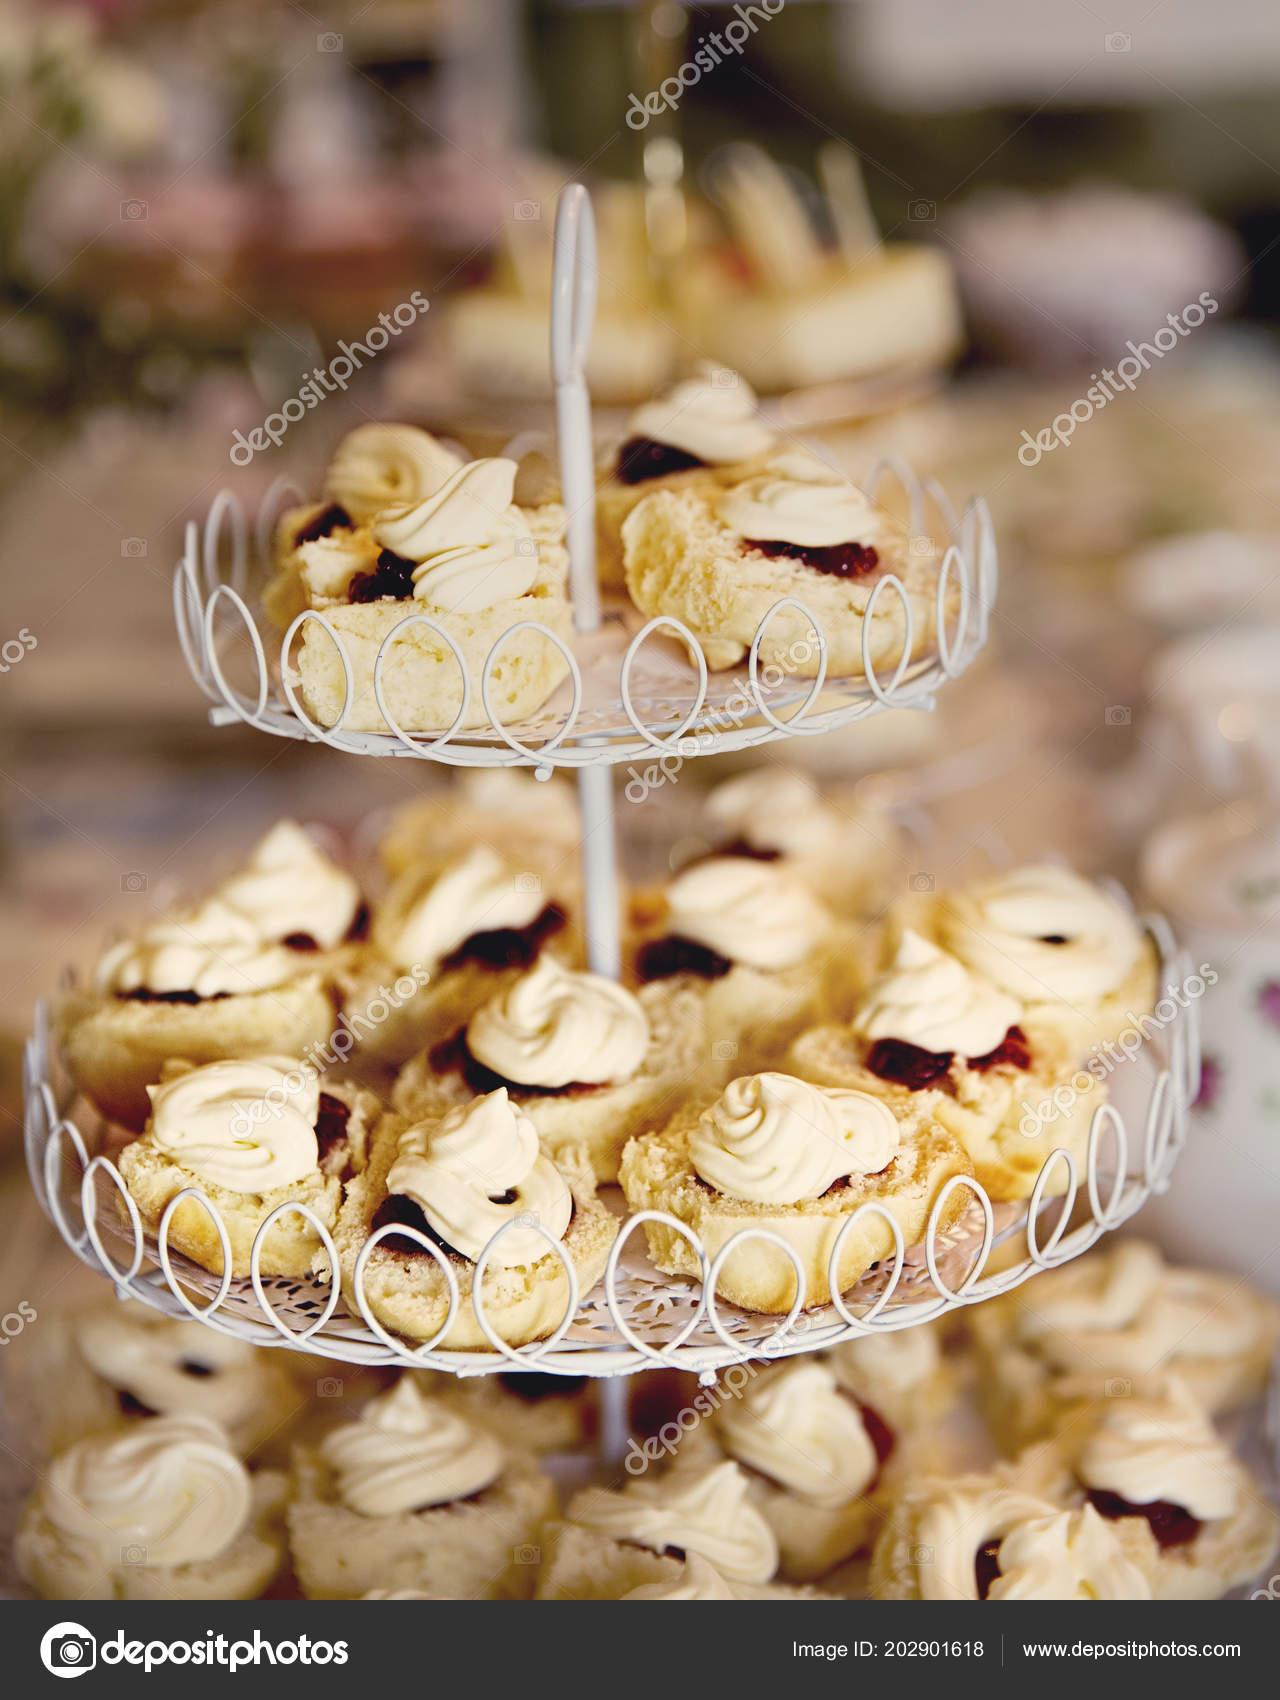 Food Bridal Shower Kitchen Tea Stock Photo C Jacksonstockphotography 202901618